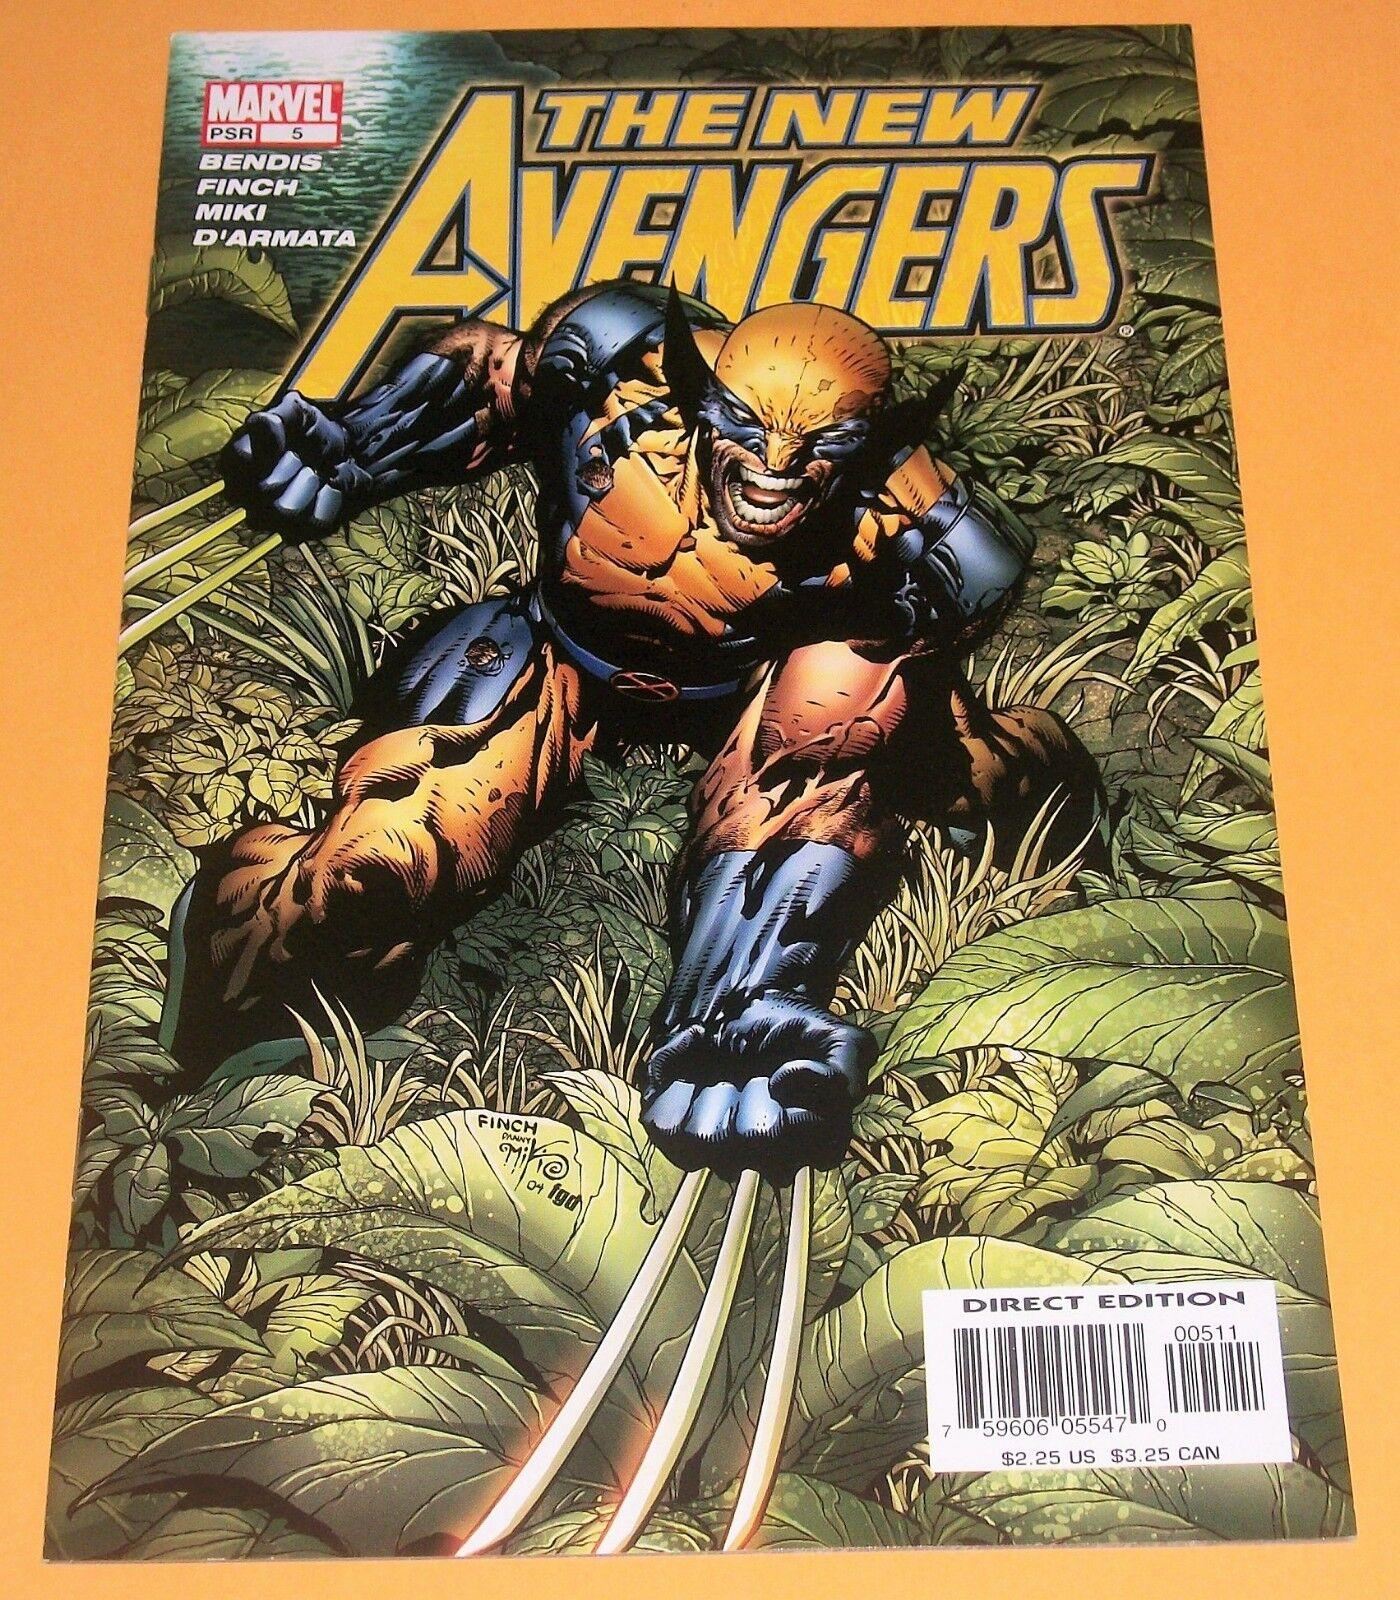 2005 Series #10 October 2005 Marvel NM 9.2 The New Avengers